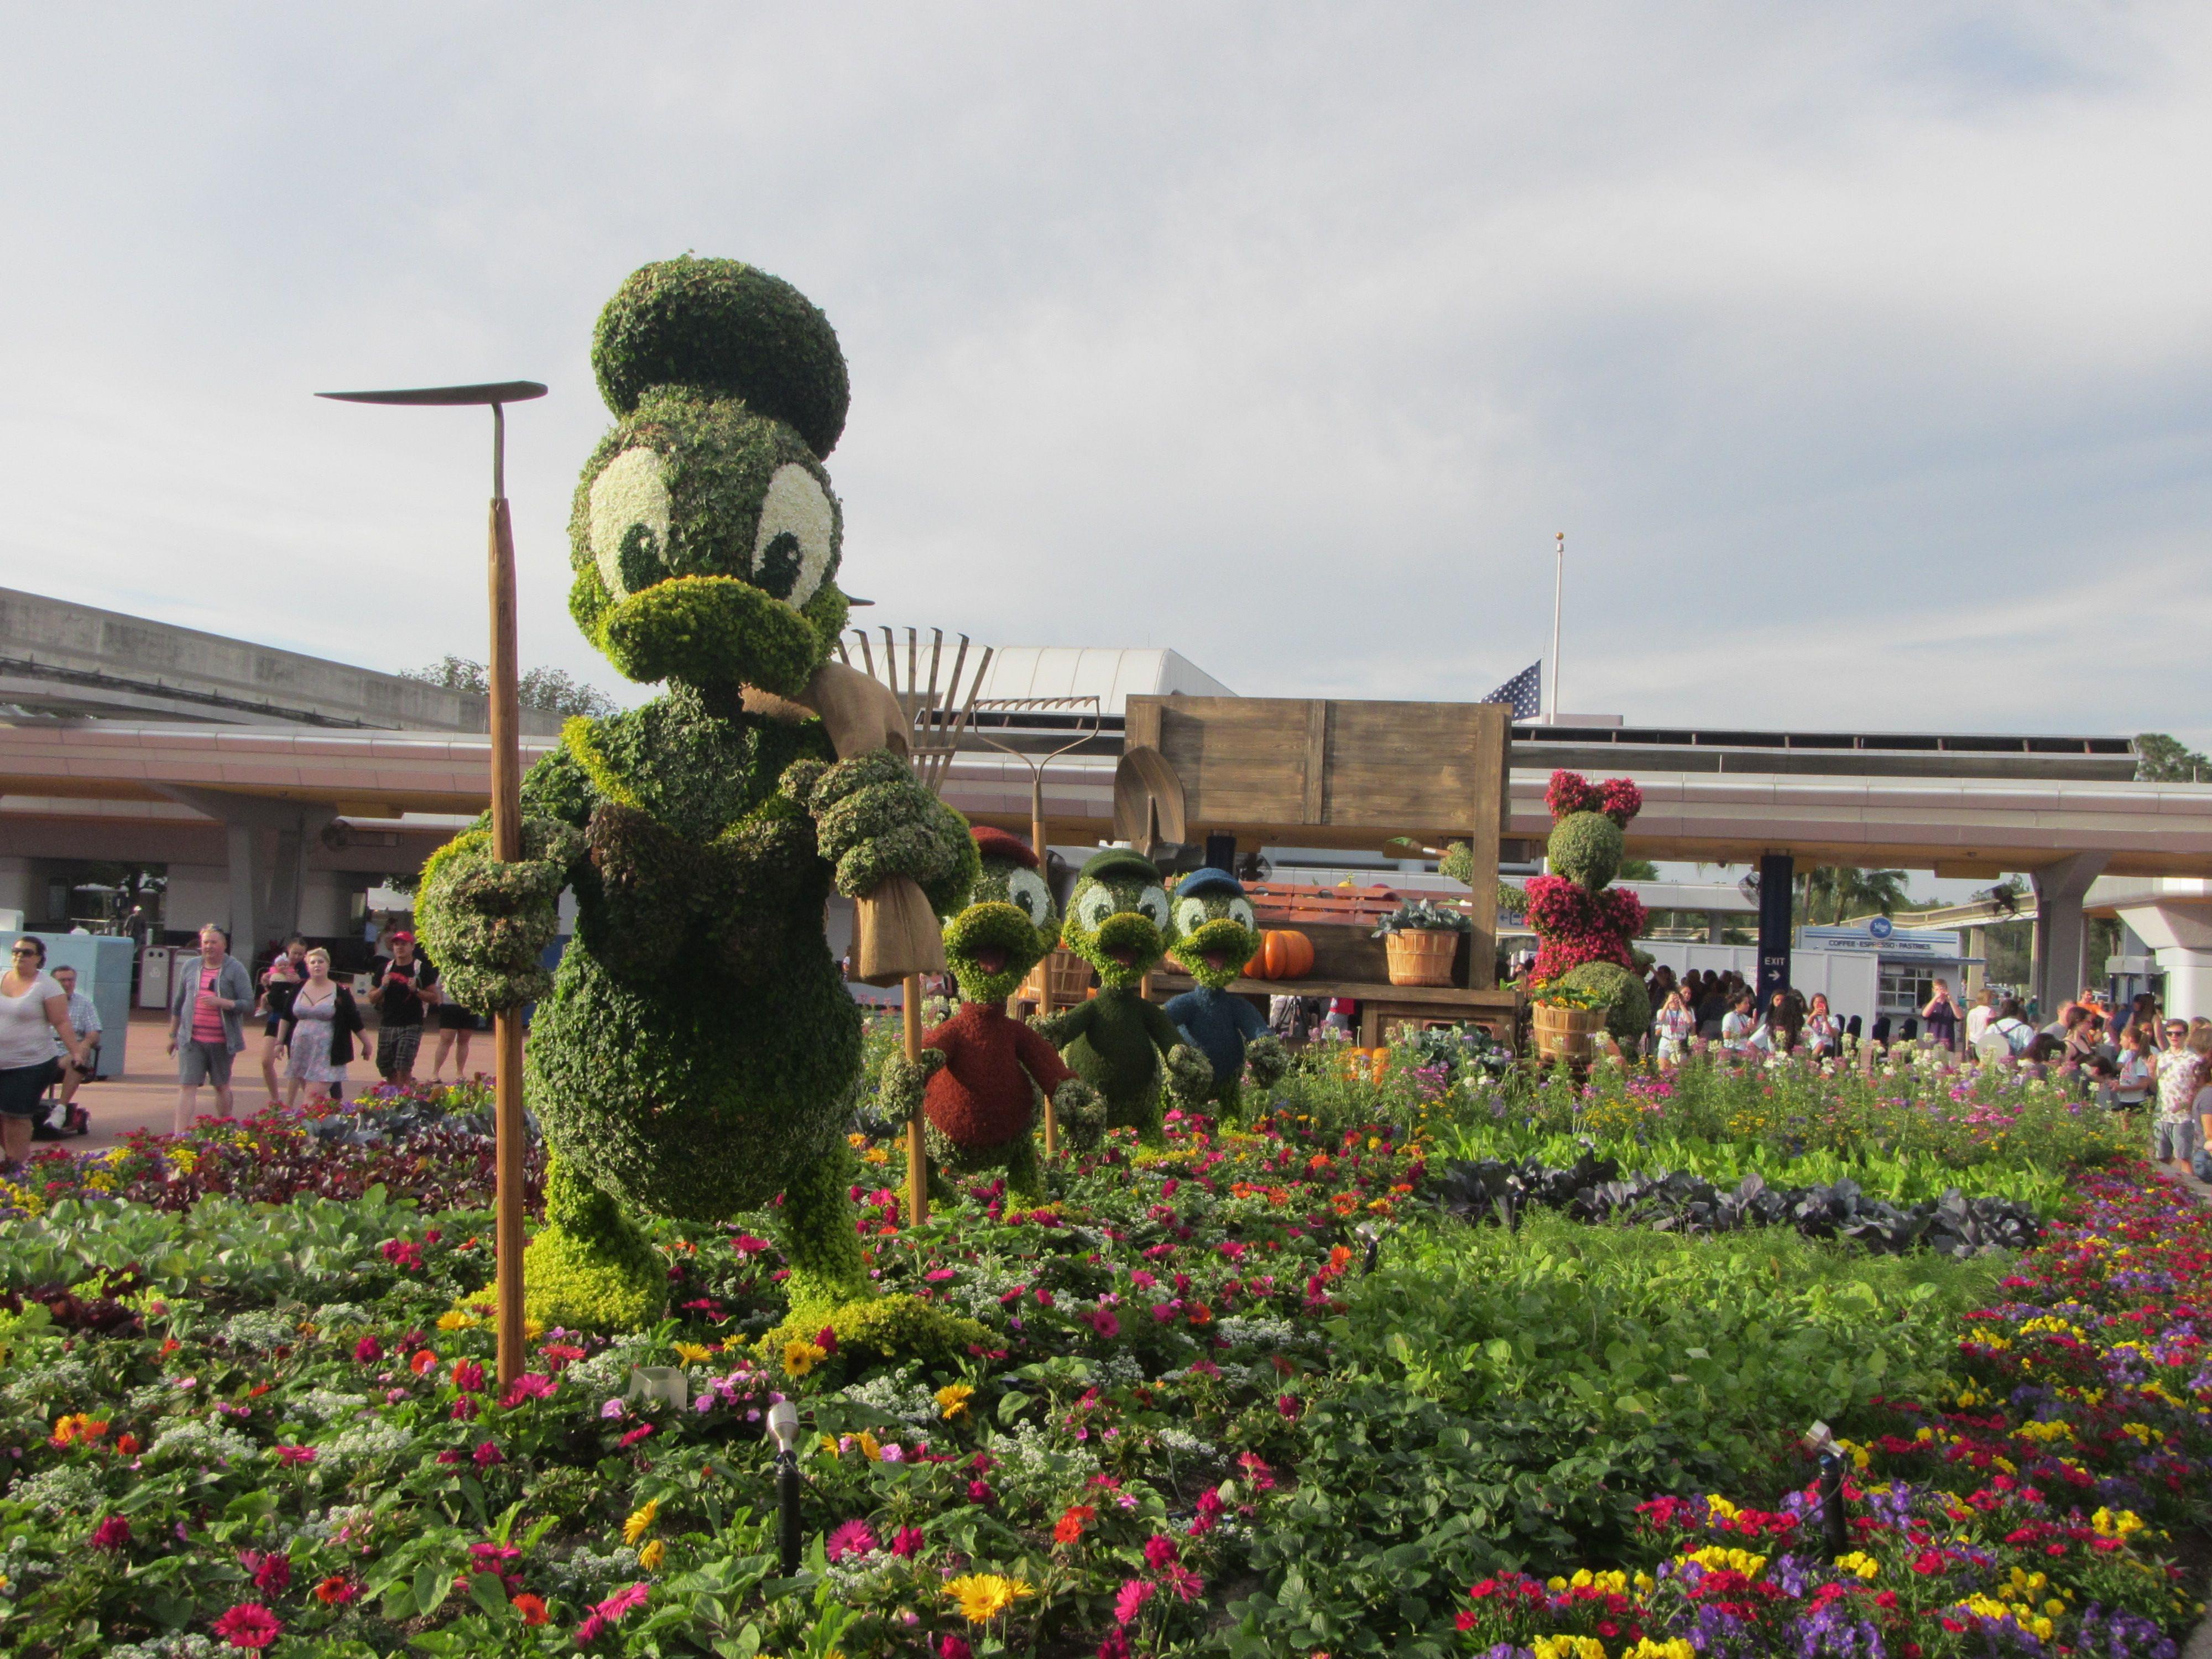 Garden festival at Disney World's Epcot center with Donald Duck greenery:  https://www.roxbeachweddings.com/honeymoon-destination-reviews/honeymoon-destination-review/